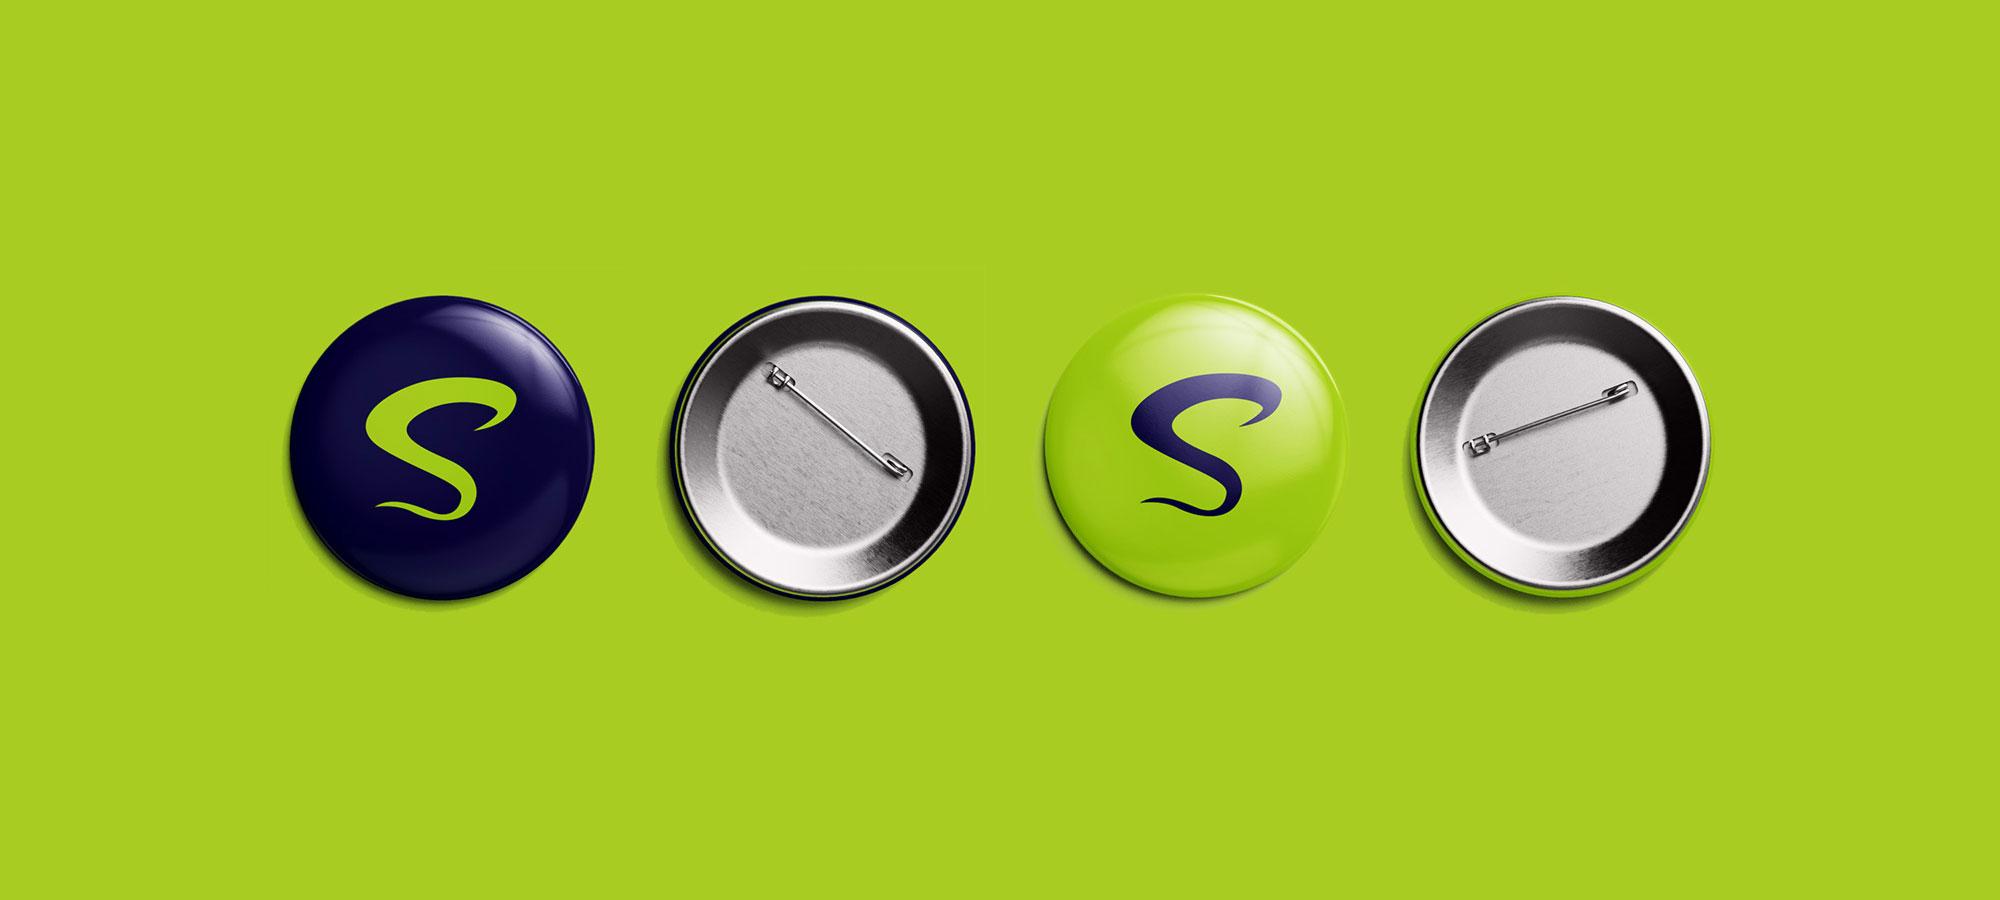 SB brand pin design